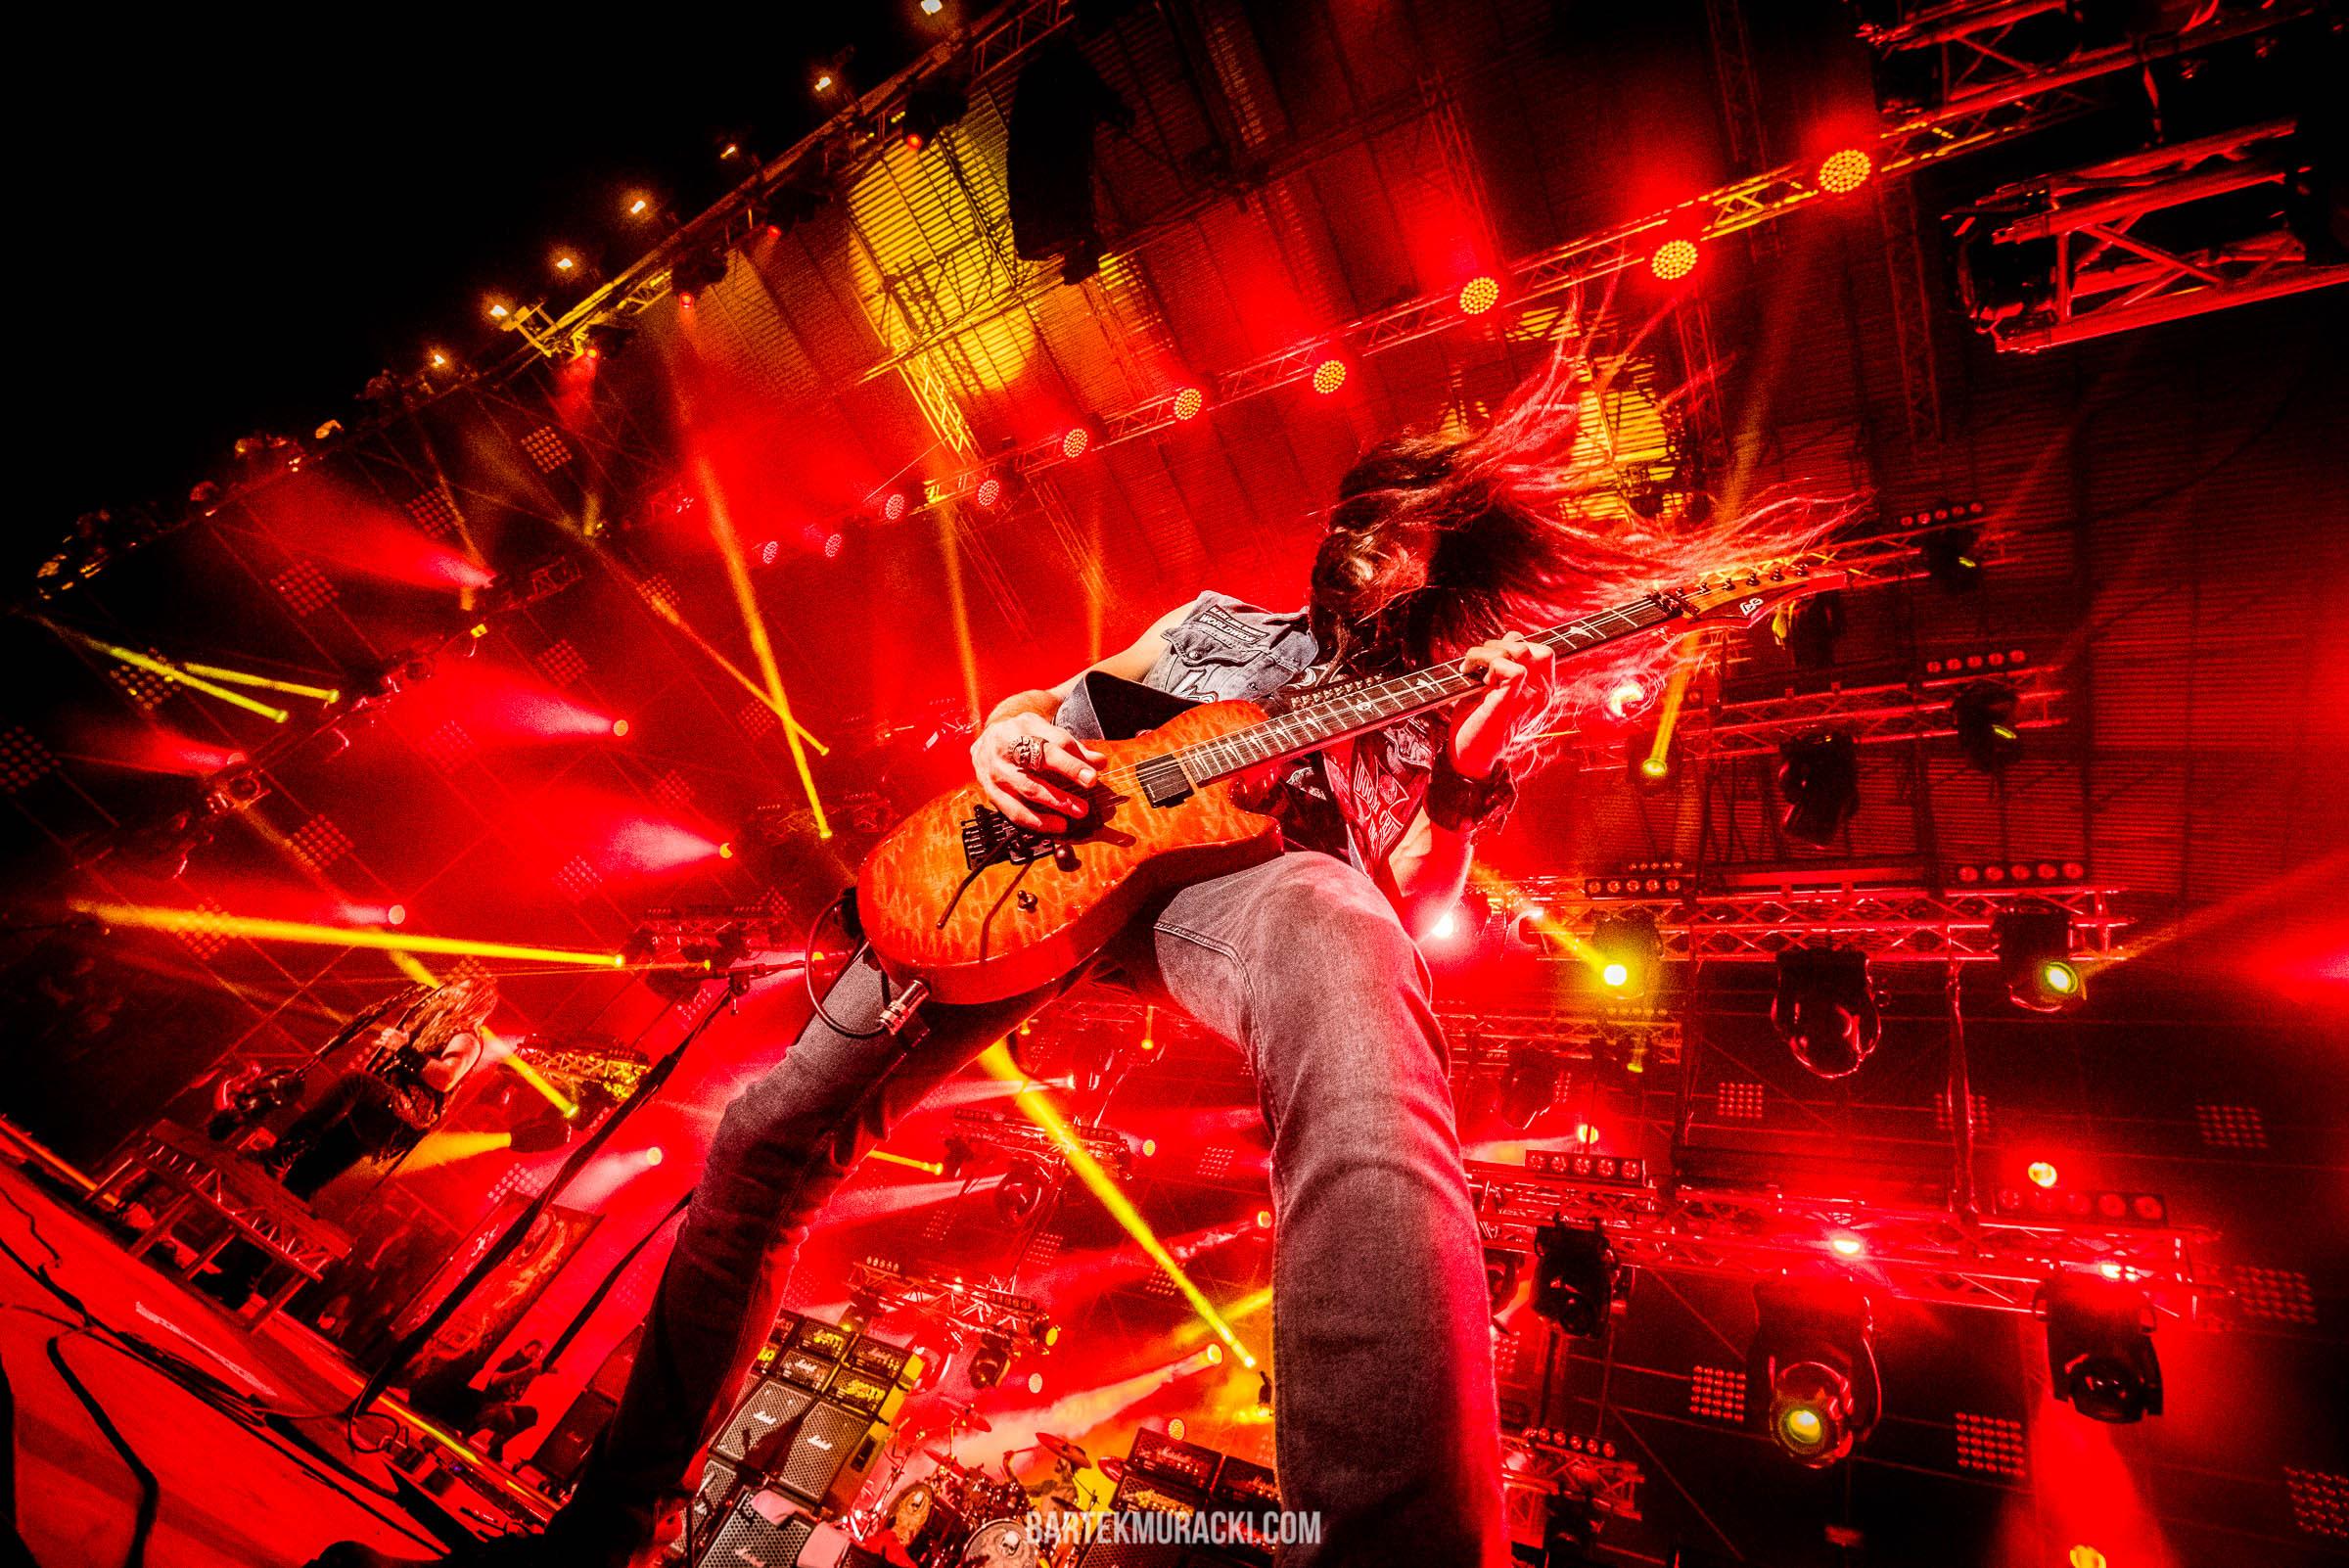 Koncerty-Przystanek-Woodstock-2015-photo-Bartek-Muracki-7834